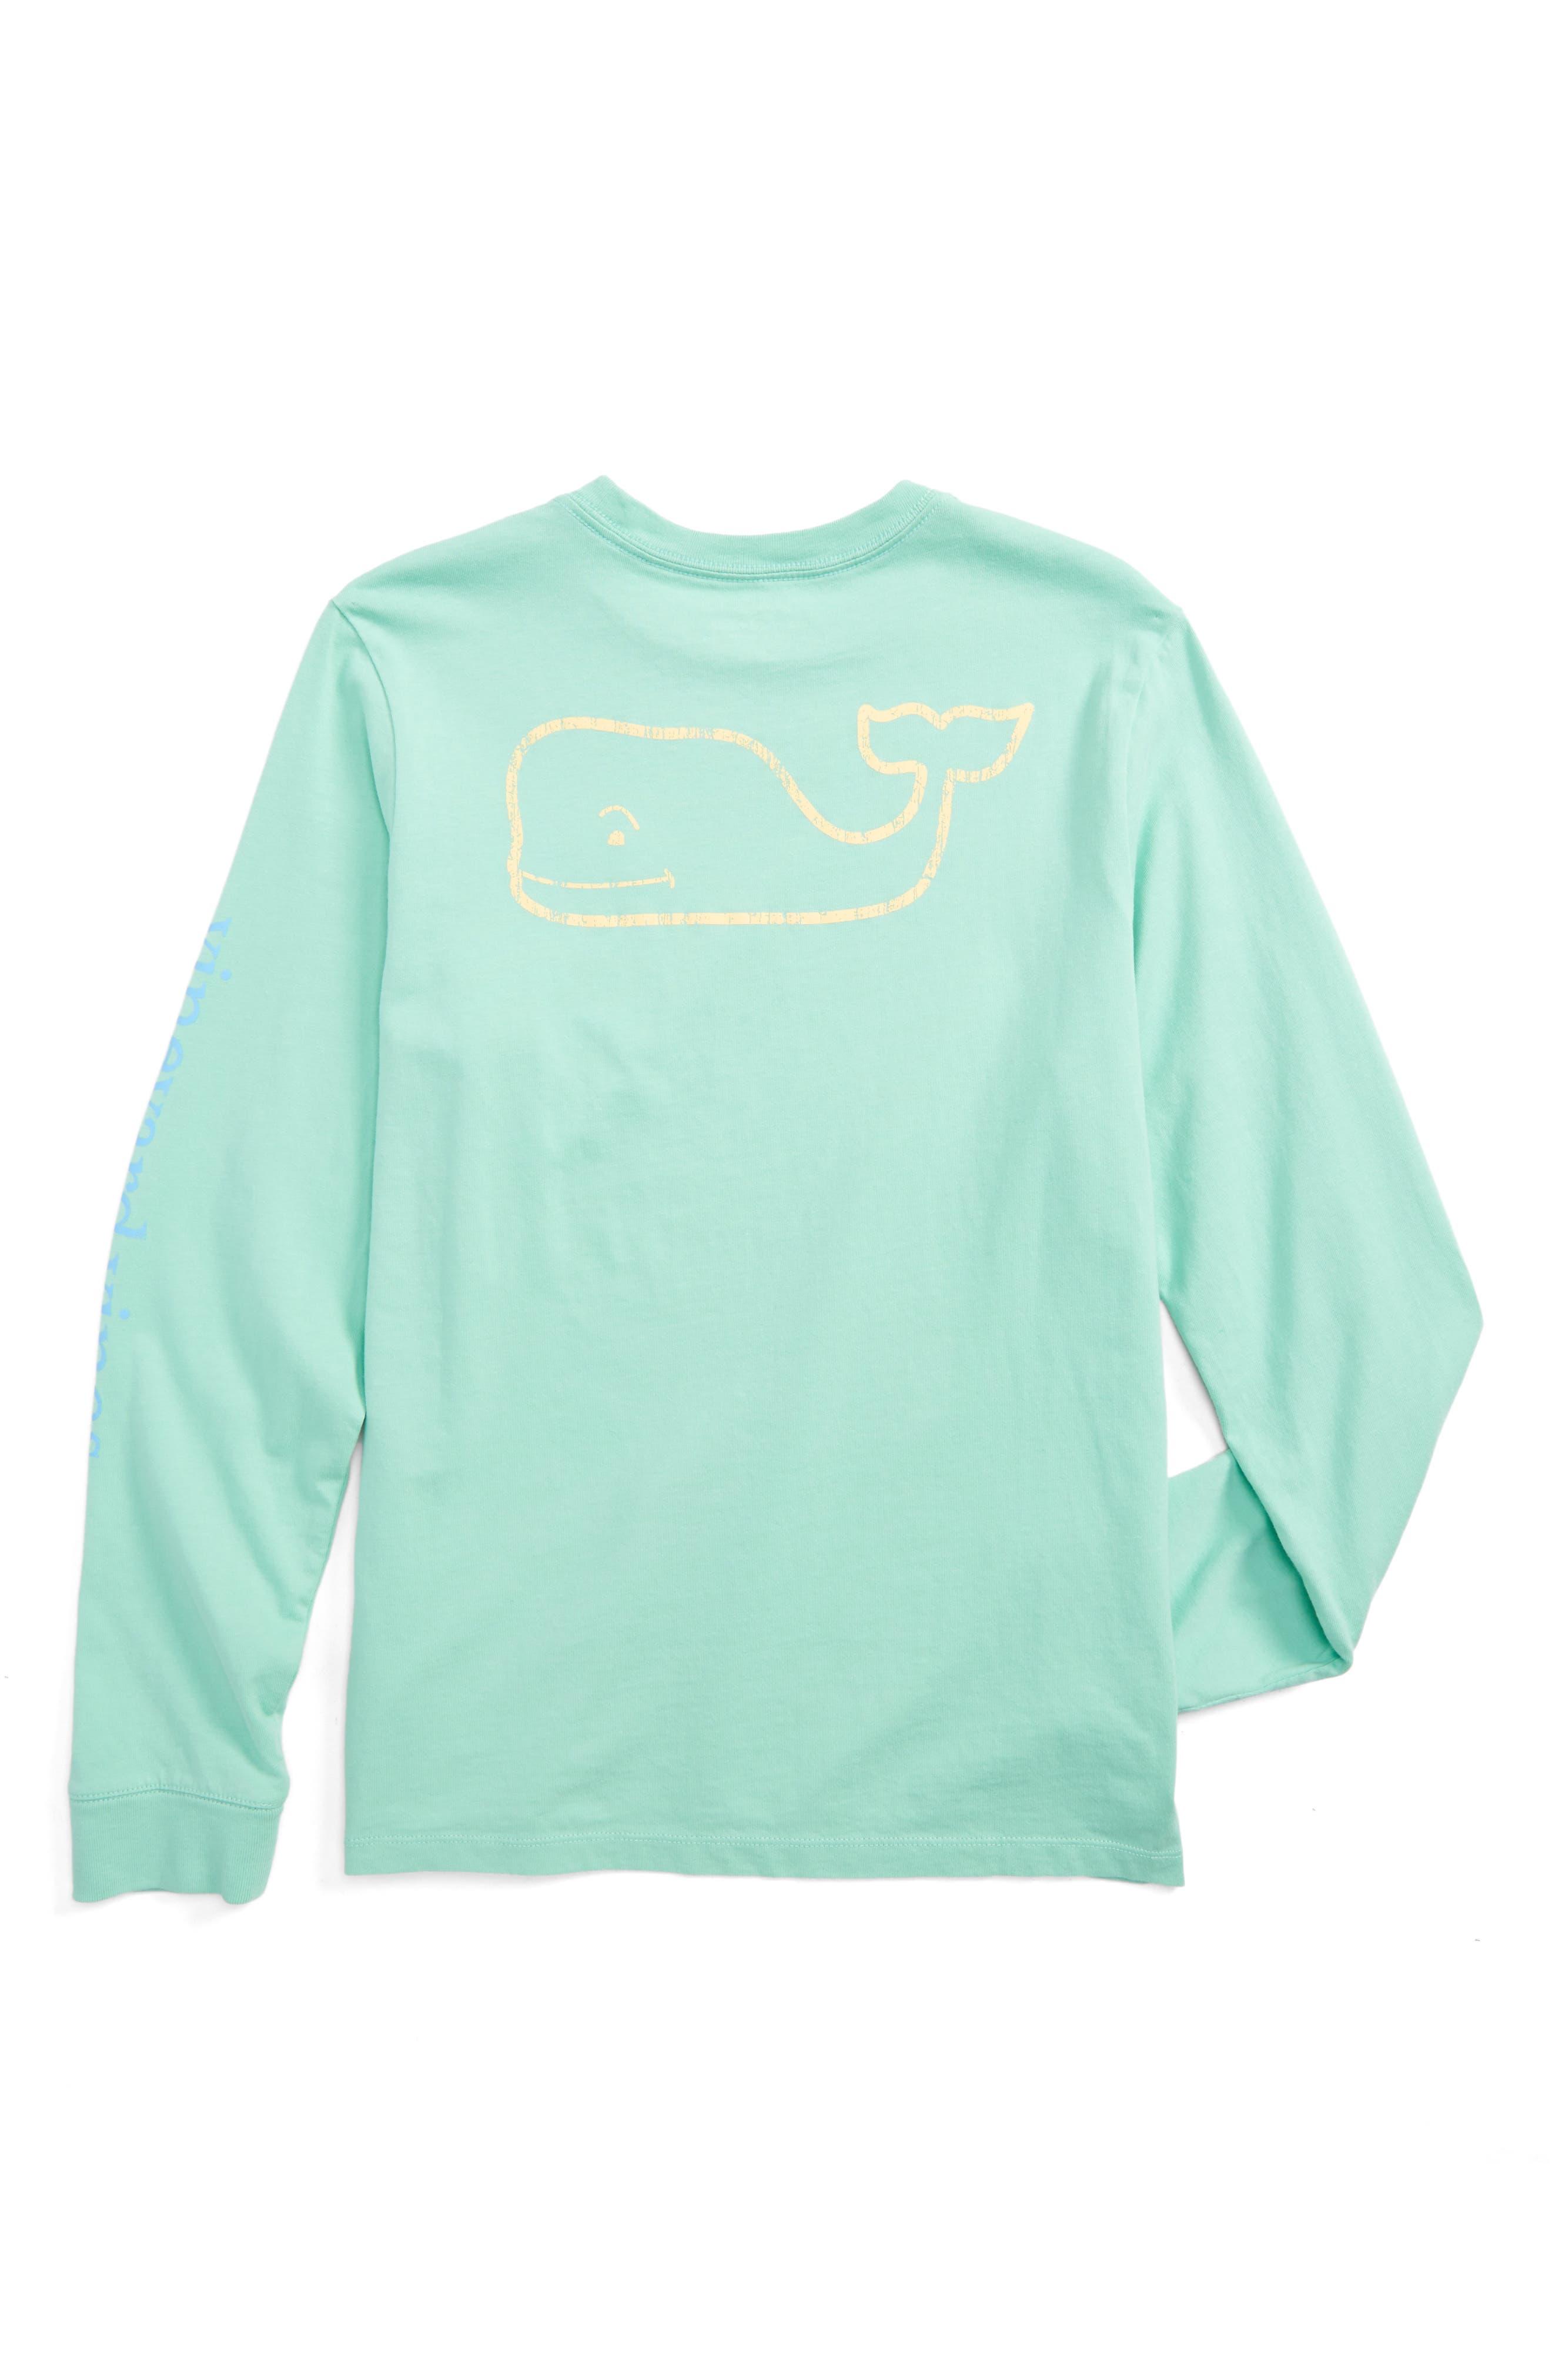 Vintage Whale Long Sleeve Pocket T-Shirt,                             Alternate thumbnail 2, color,                             343